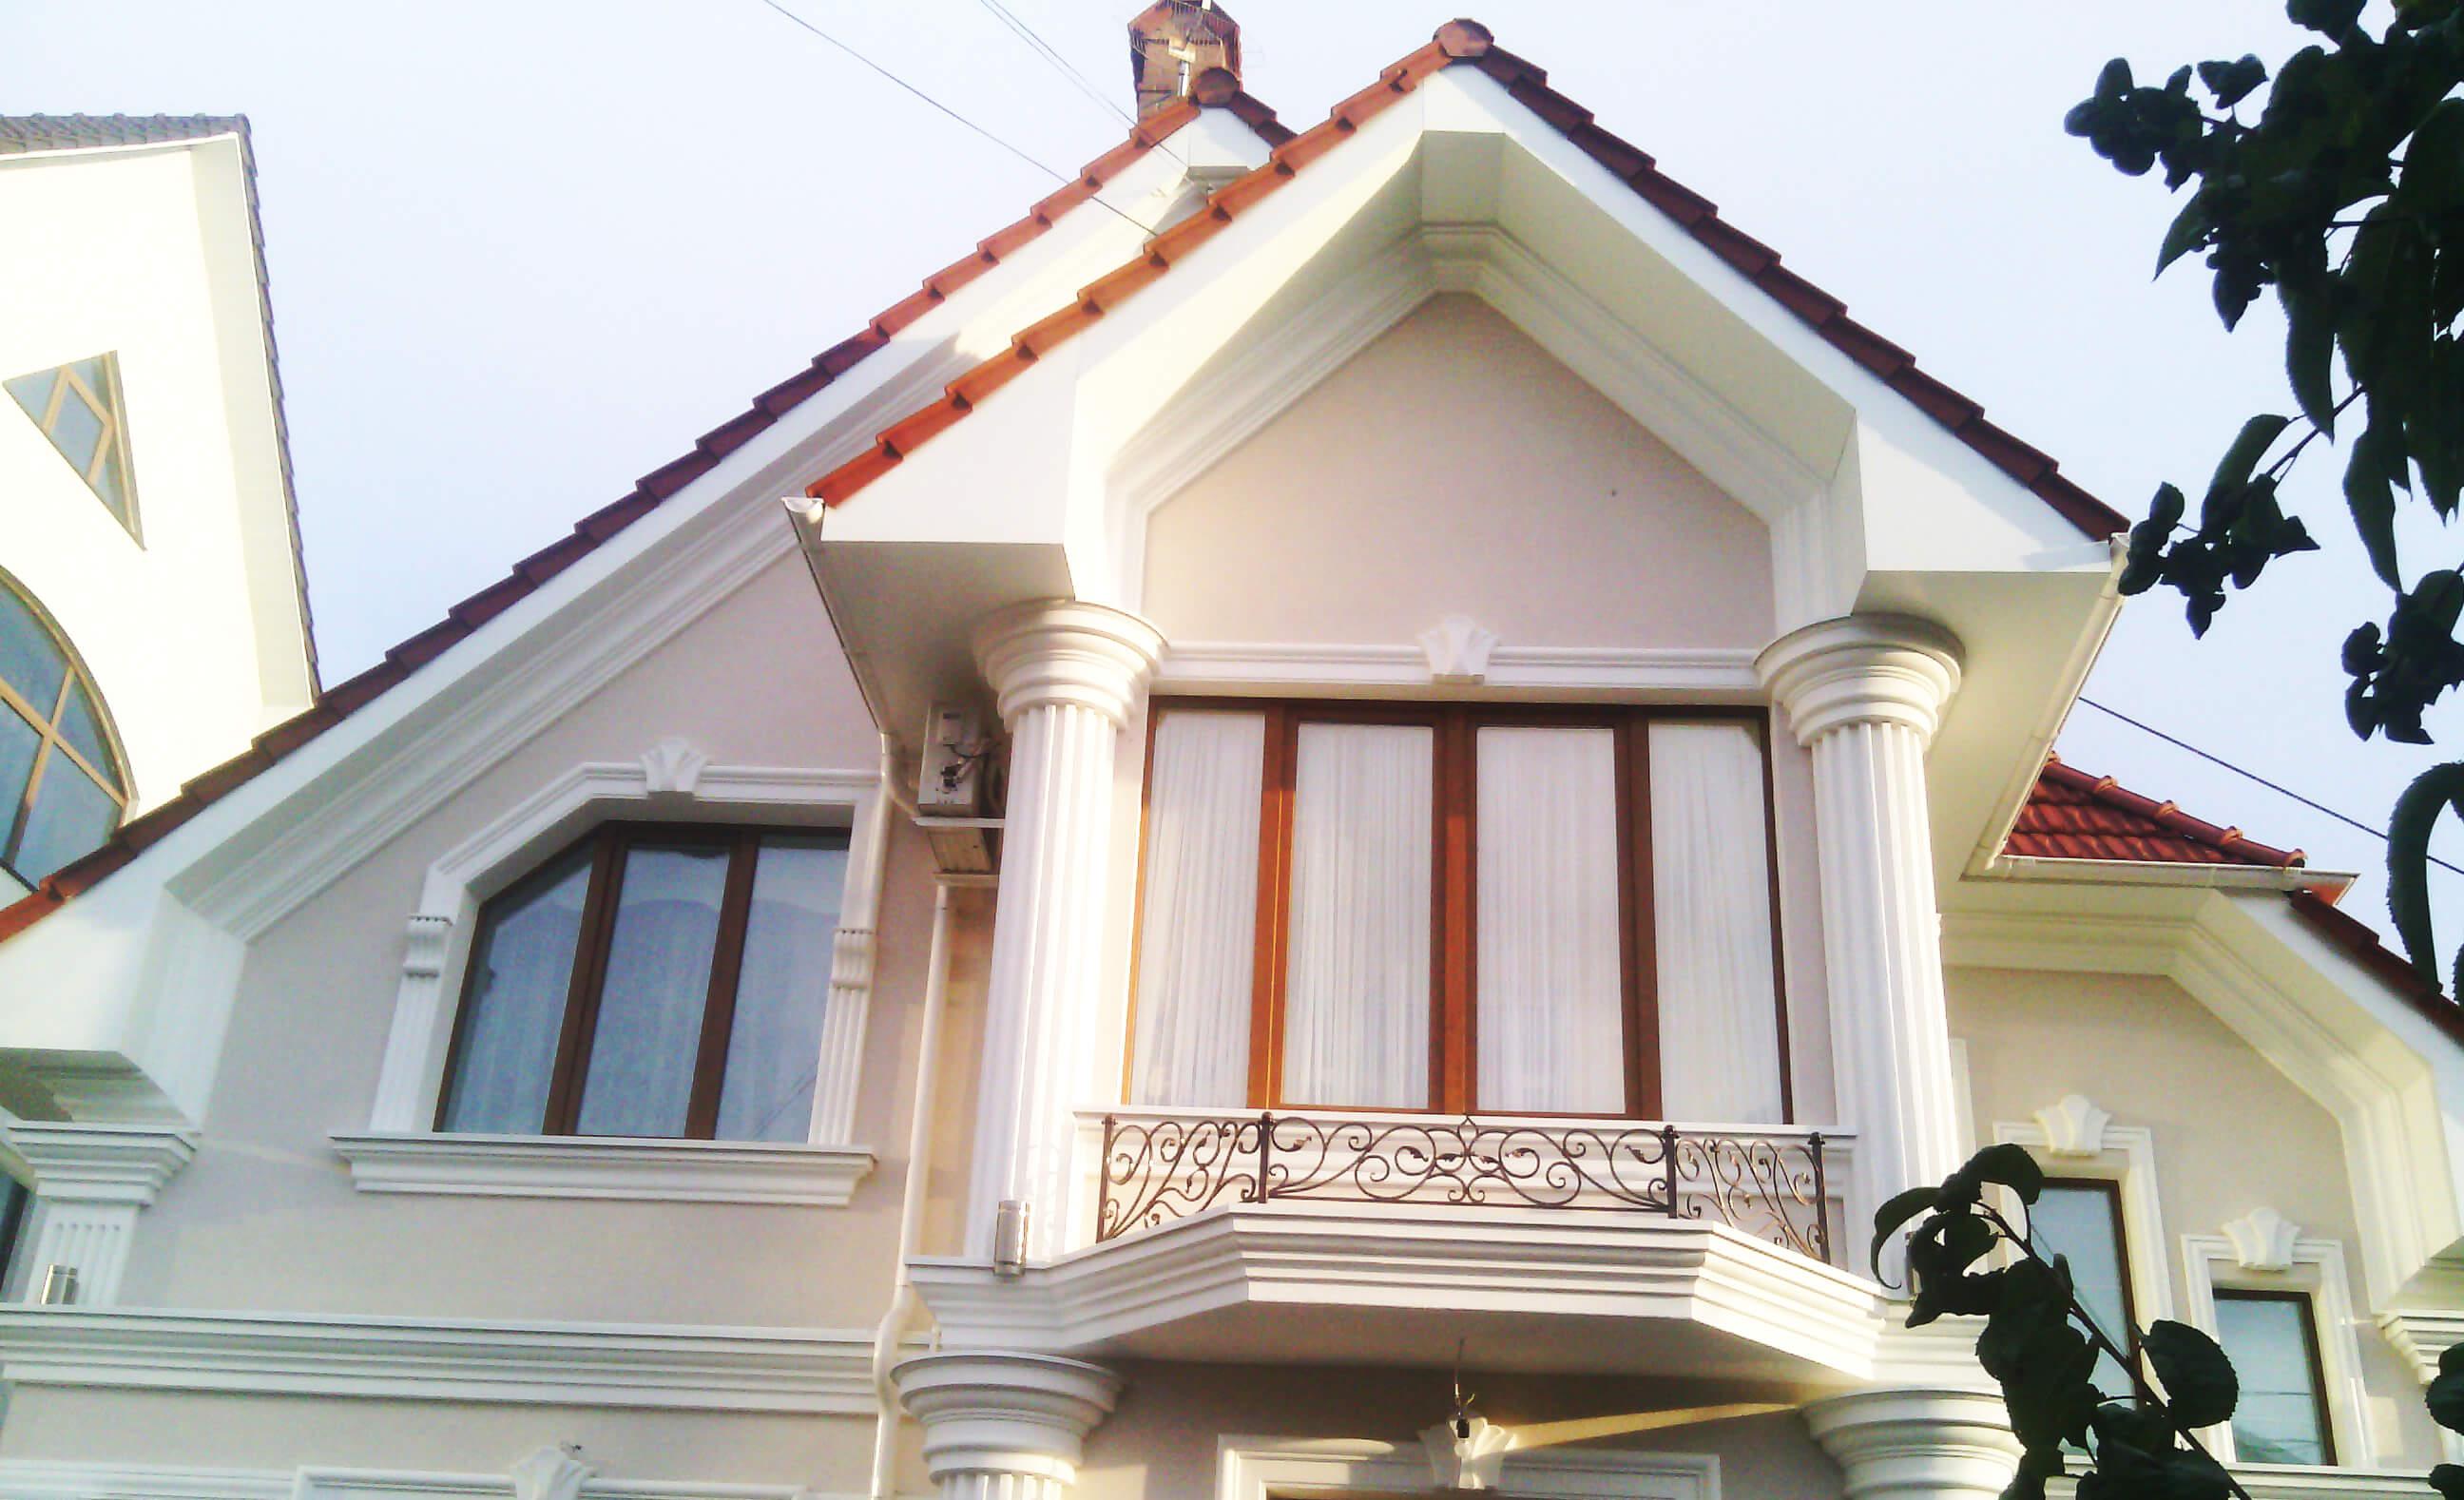 Streasina casei din panouri de aluminiu compozit, Chisinau, Moldova